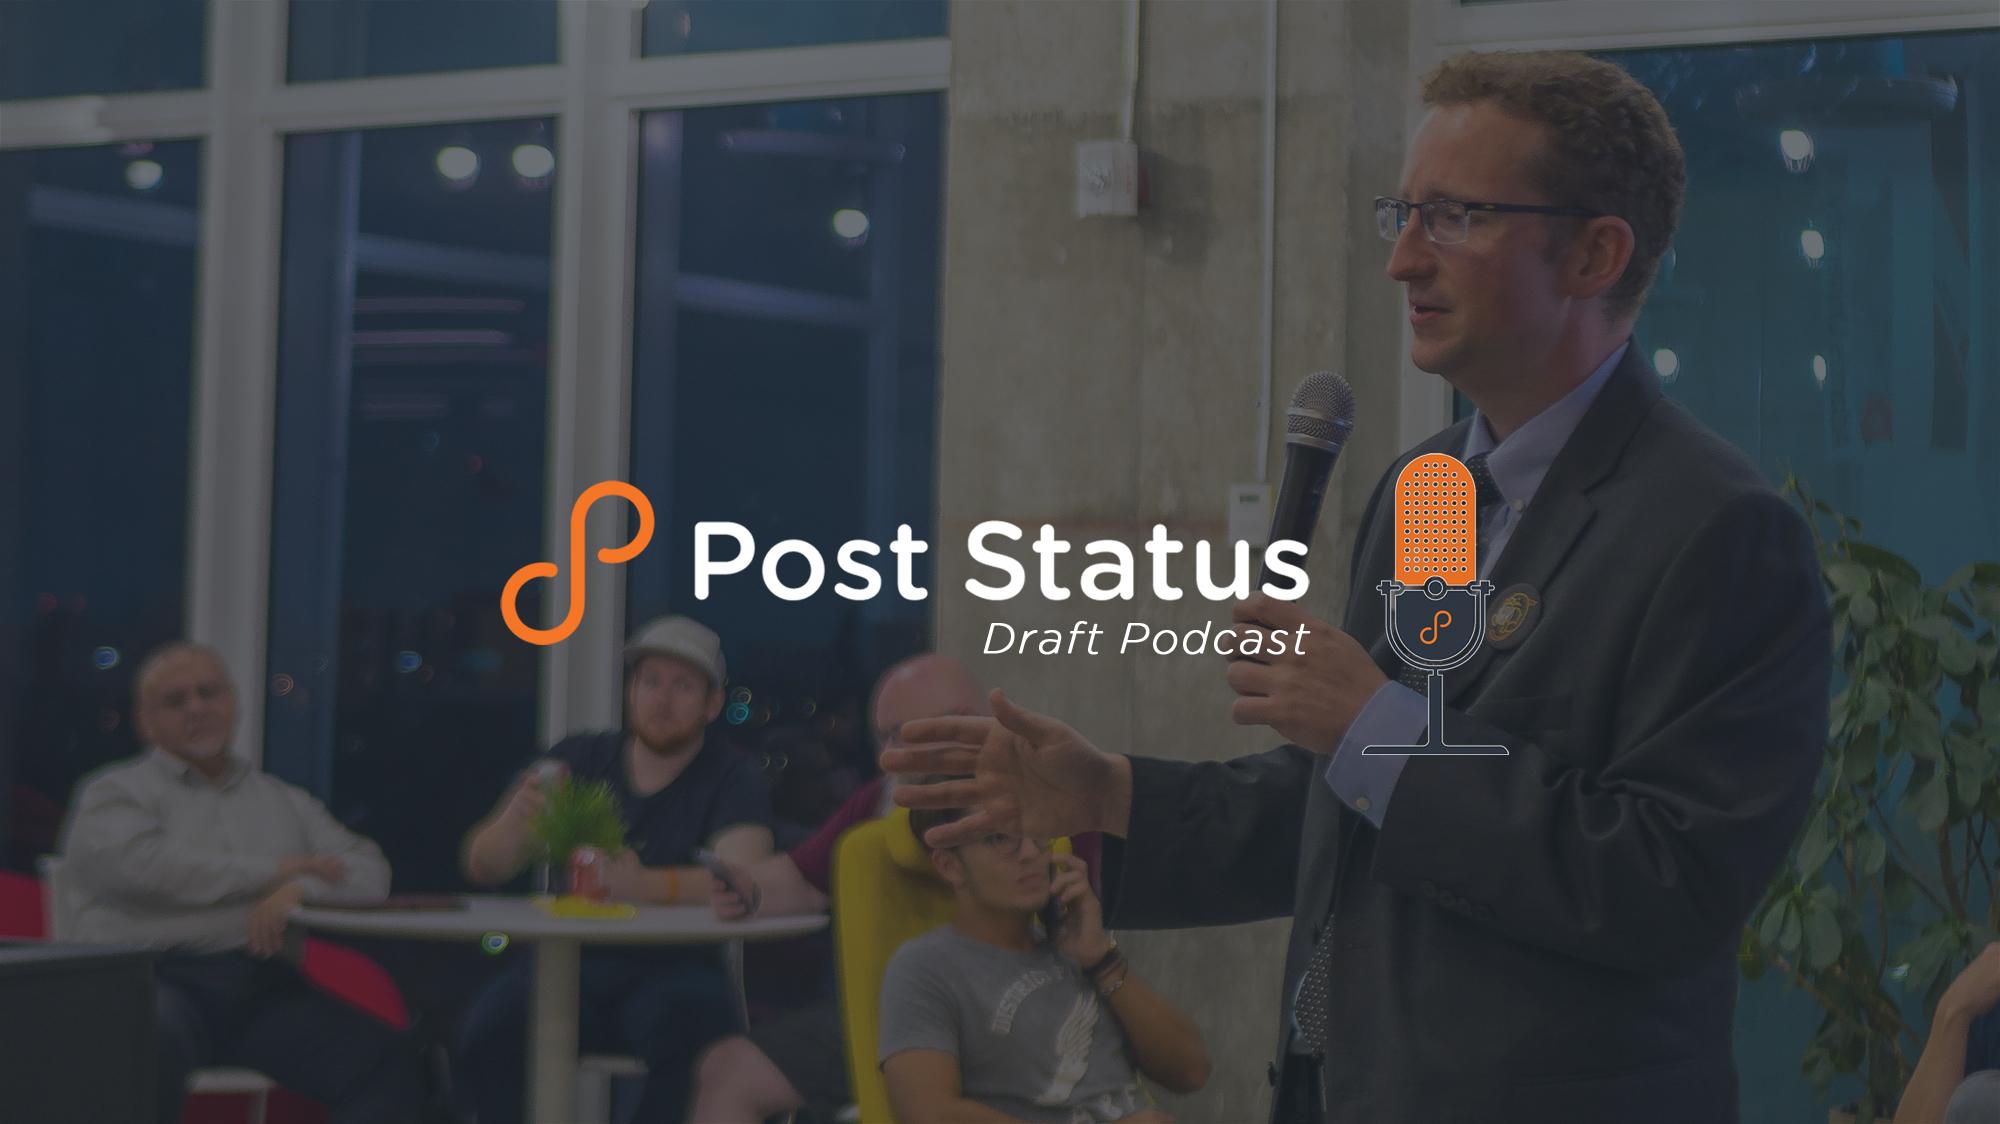 Post Status Draft Podcast